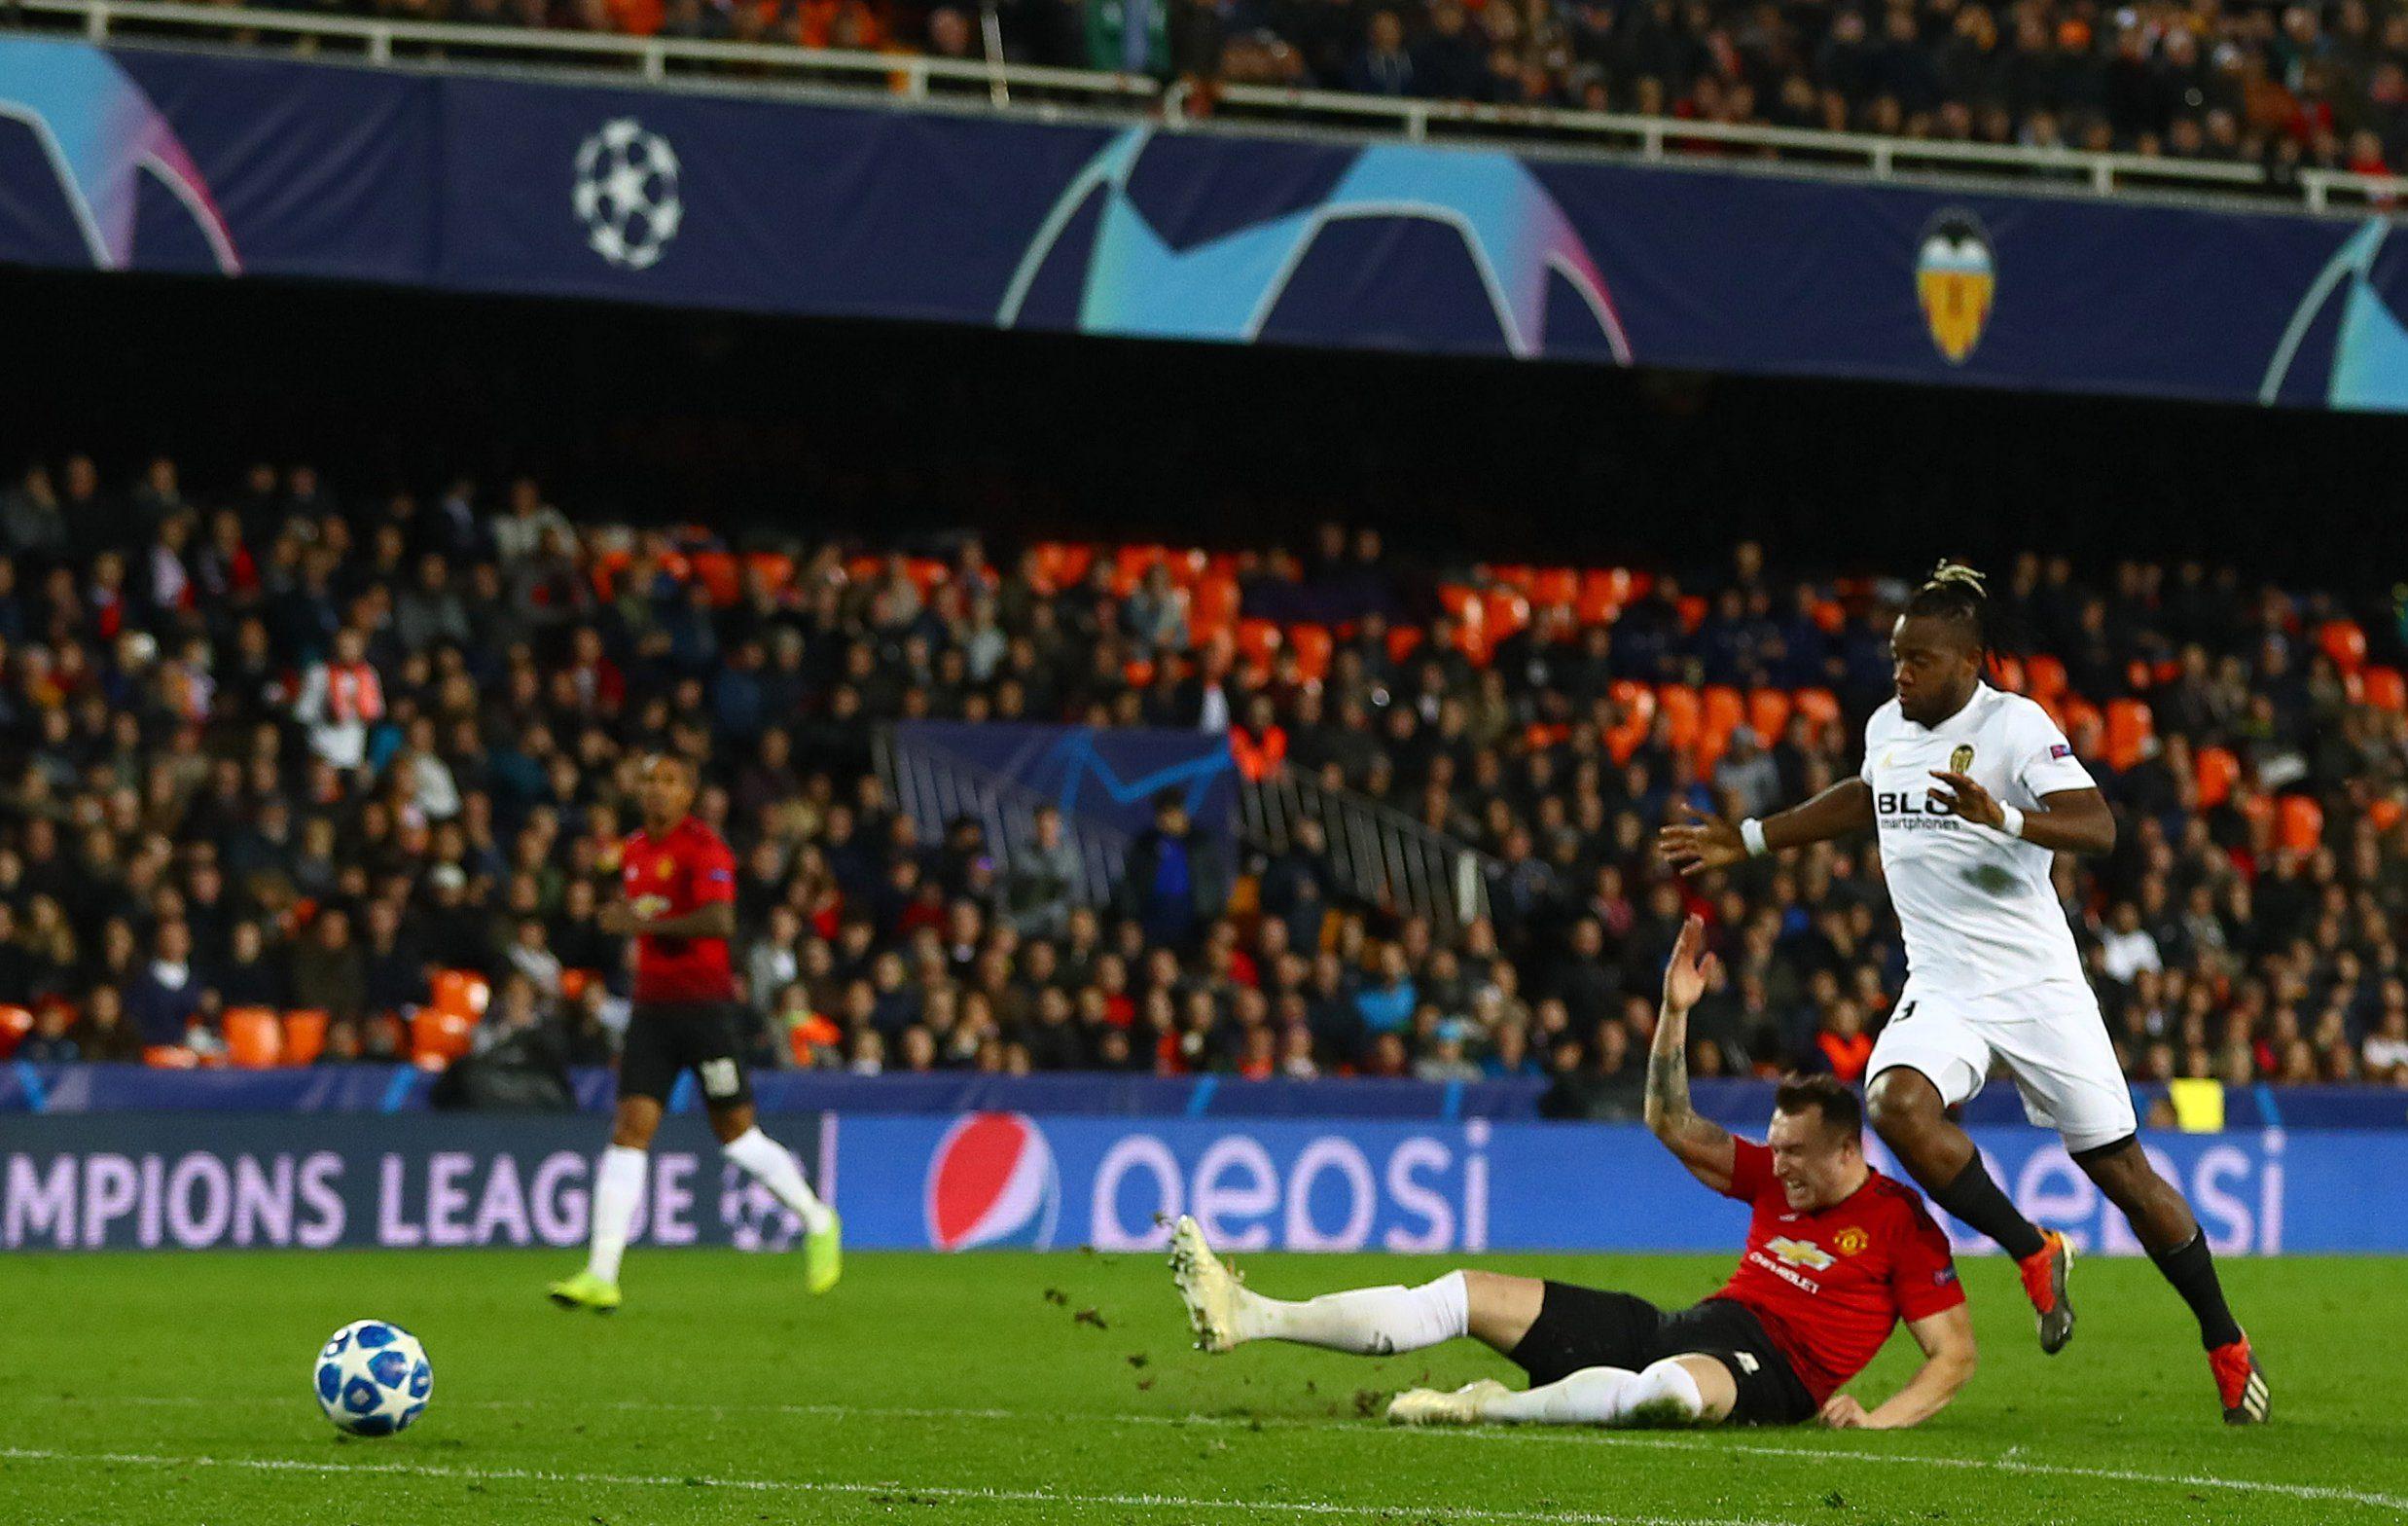 Mandatory Credit: Photo by Kieran McManus/BPI/REX (10031595af) Phil Jones of Manchester United scores an own goal to make it 2-0 Valencia v Manchester United, UEFA Champions League Group H, Football, Mestalla Stadium, Valencia, Spain - 12 Dec 2018